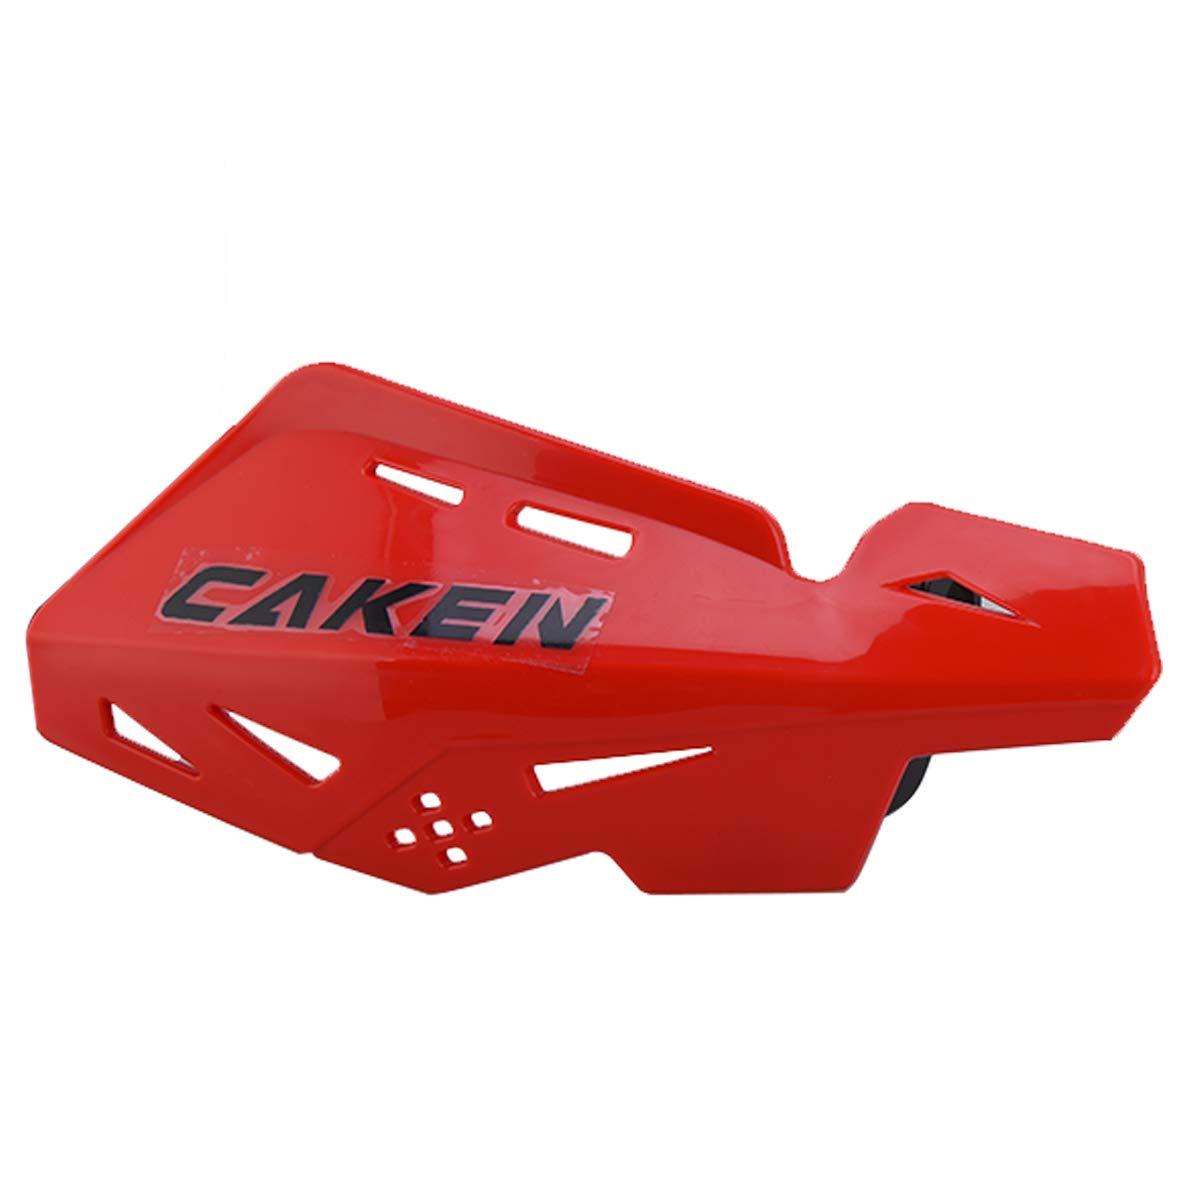 Fluorescent Green PRO CAKEN CNC Handle Bar Hand Guards Protector Dirt Bike Motocross ATV for SX SXF EXC XCW